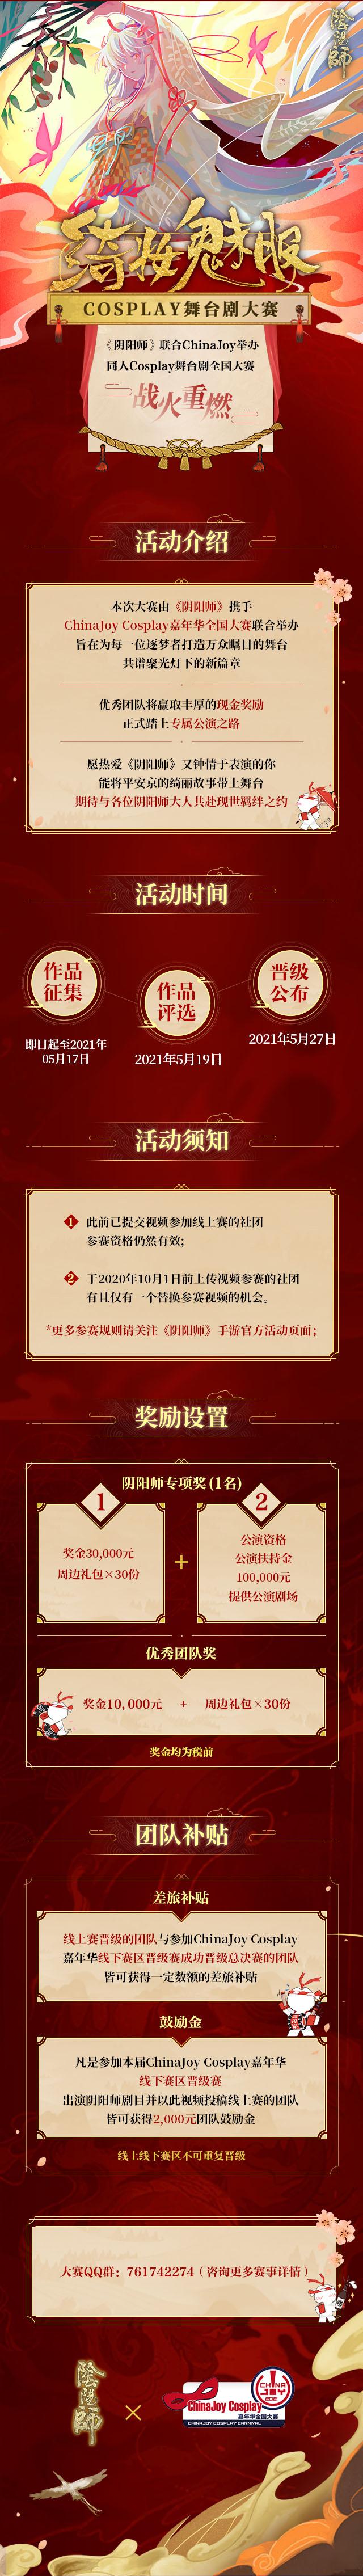 CJCos嘉年华携手《阴阳师》绮妆魅影Cosplay舞台剧